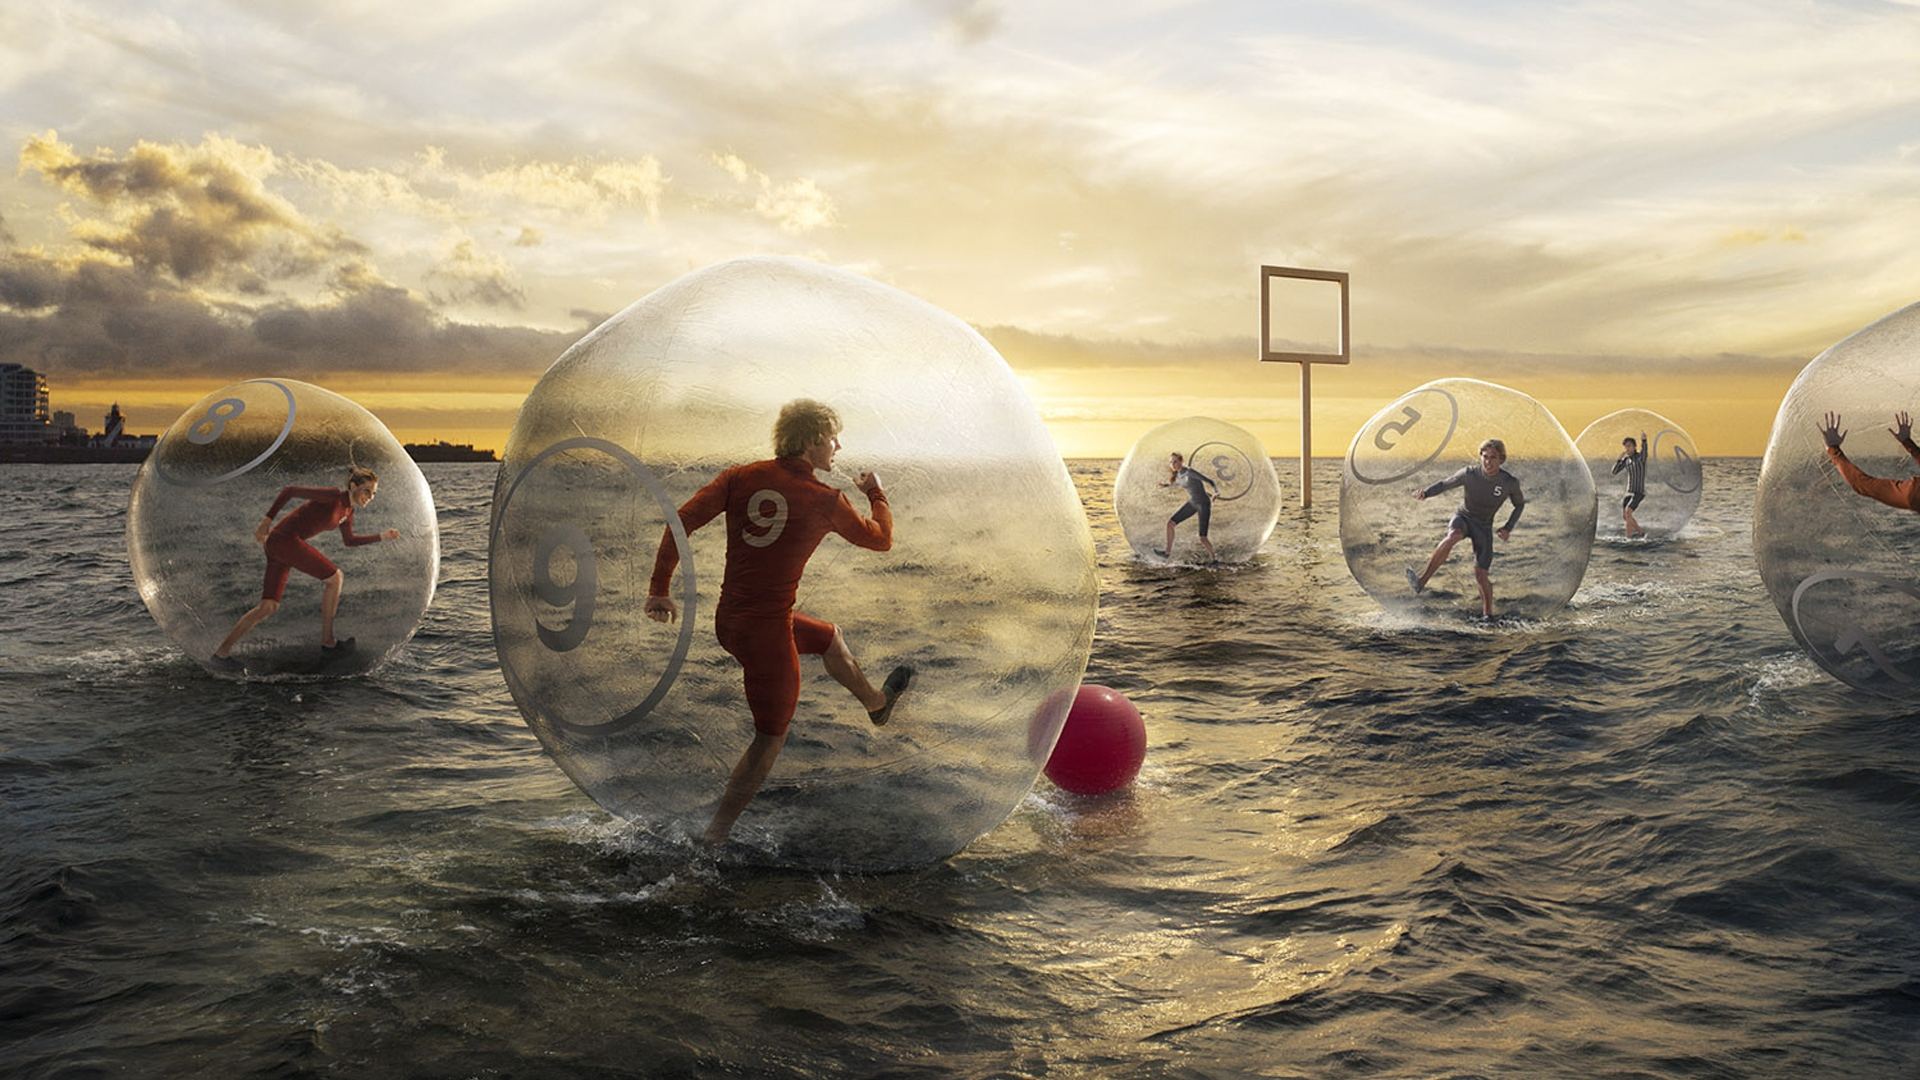 1920x1080-football-water-ball-sky-people-wallpaper-wp340930